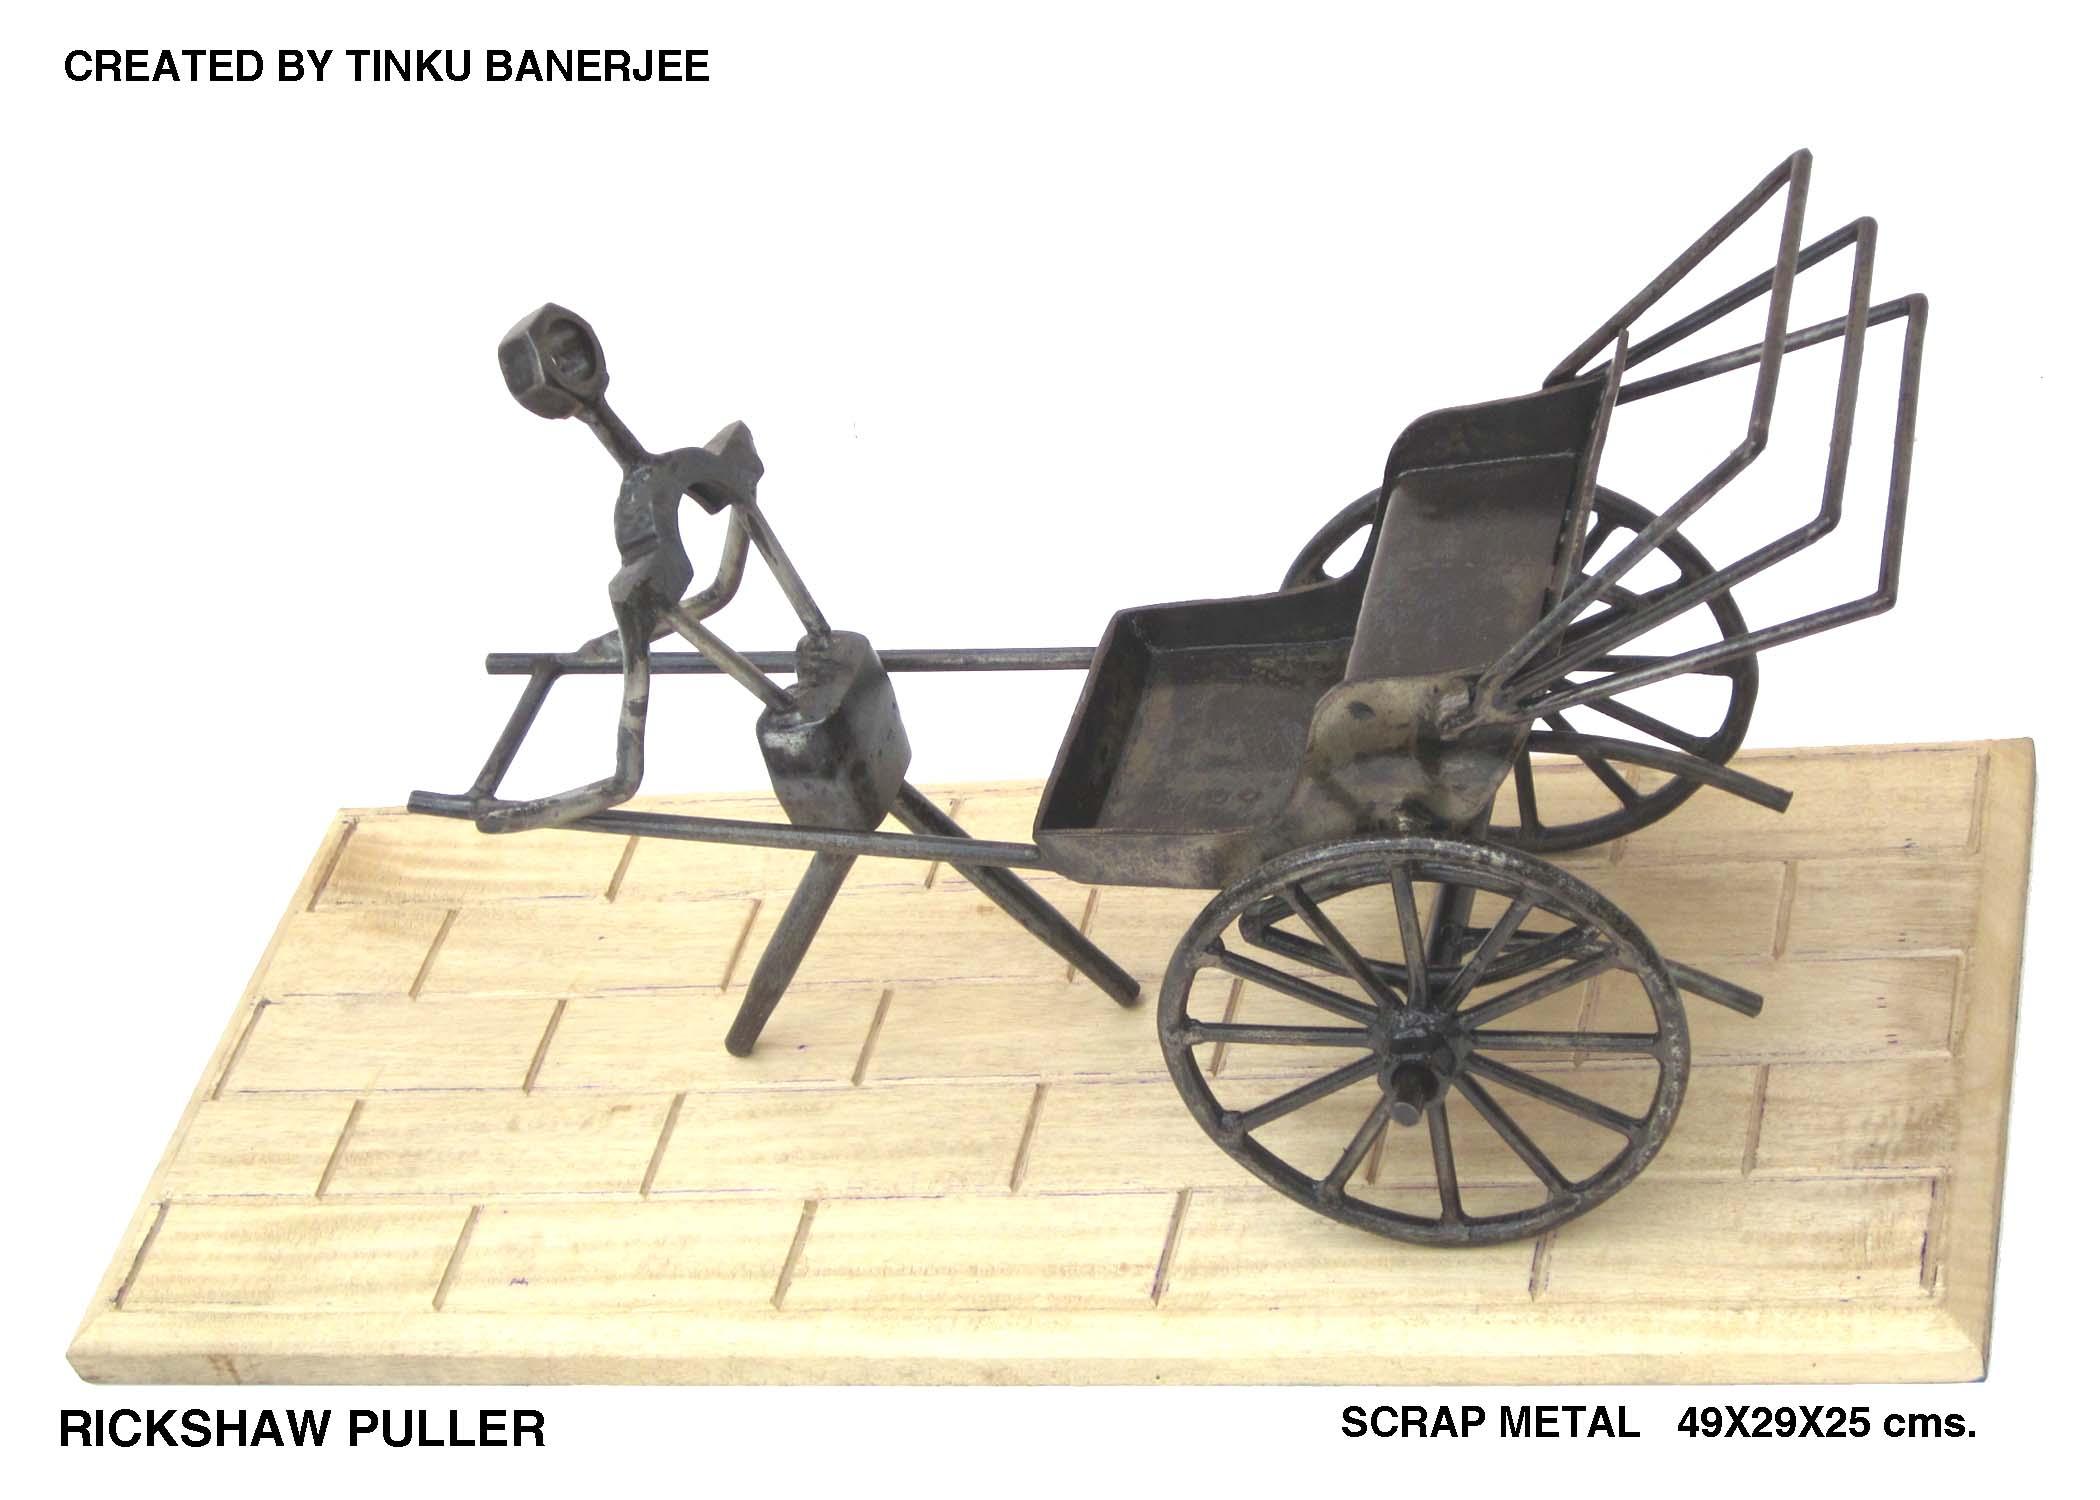 Rickshaw Puller Sculptures